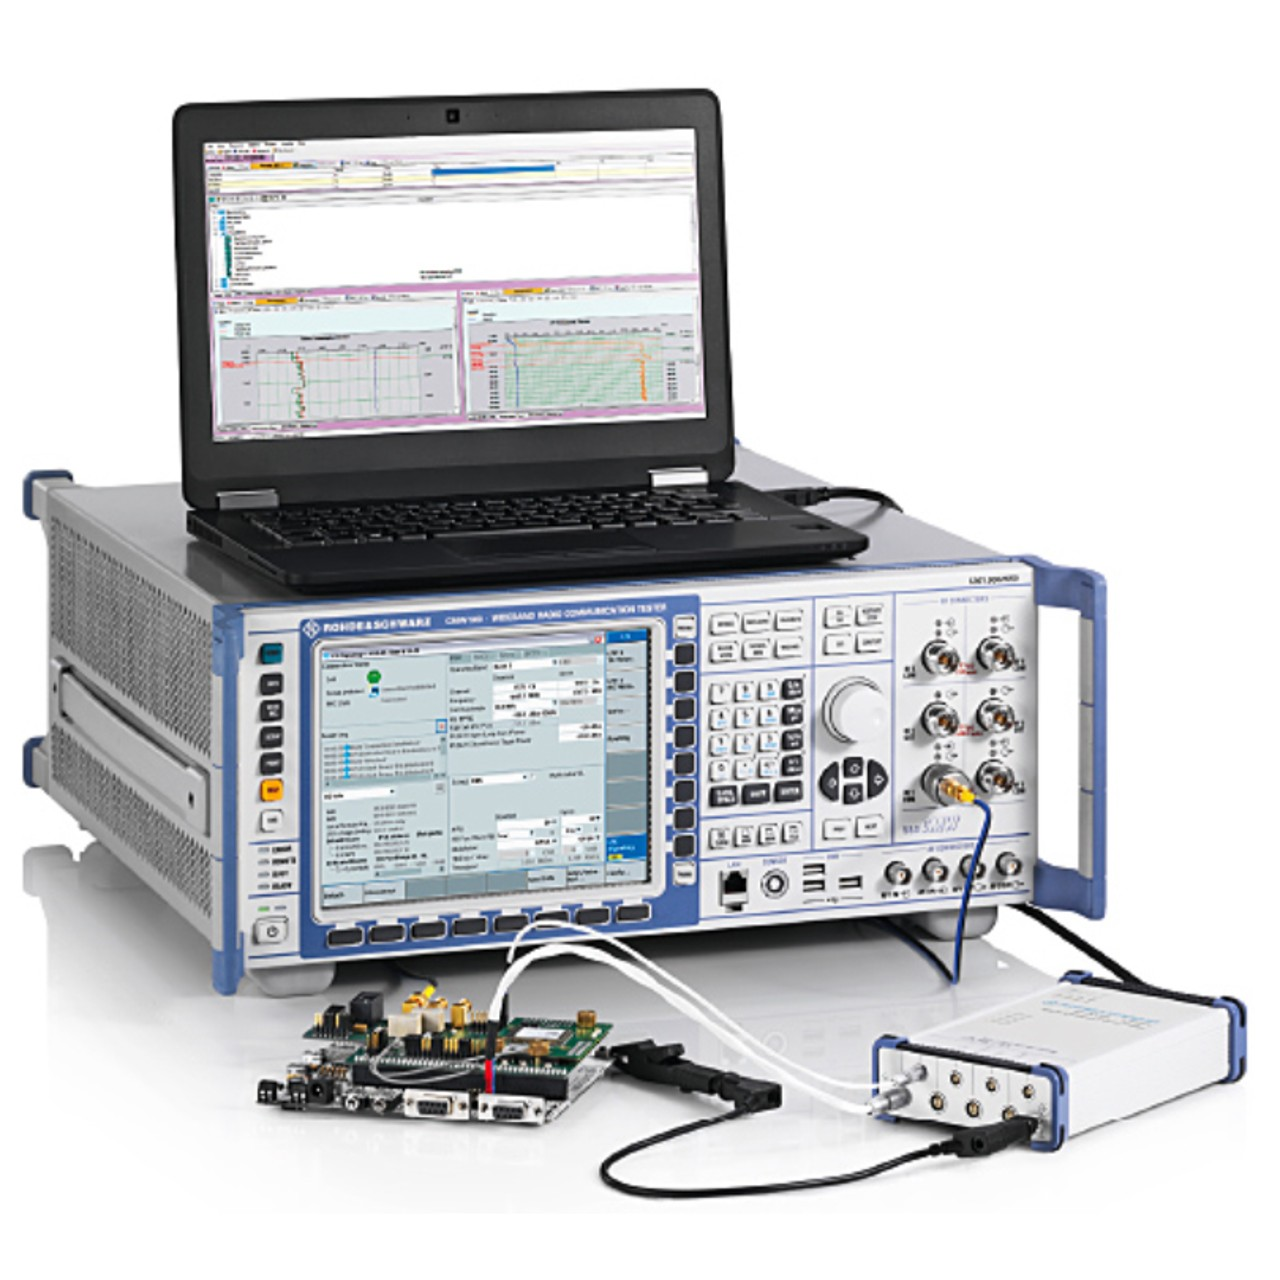 cmwrun-battery-life-measurements_ac_02_810x.jpg